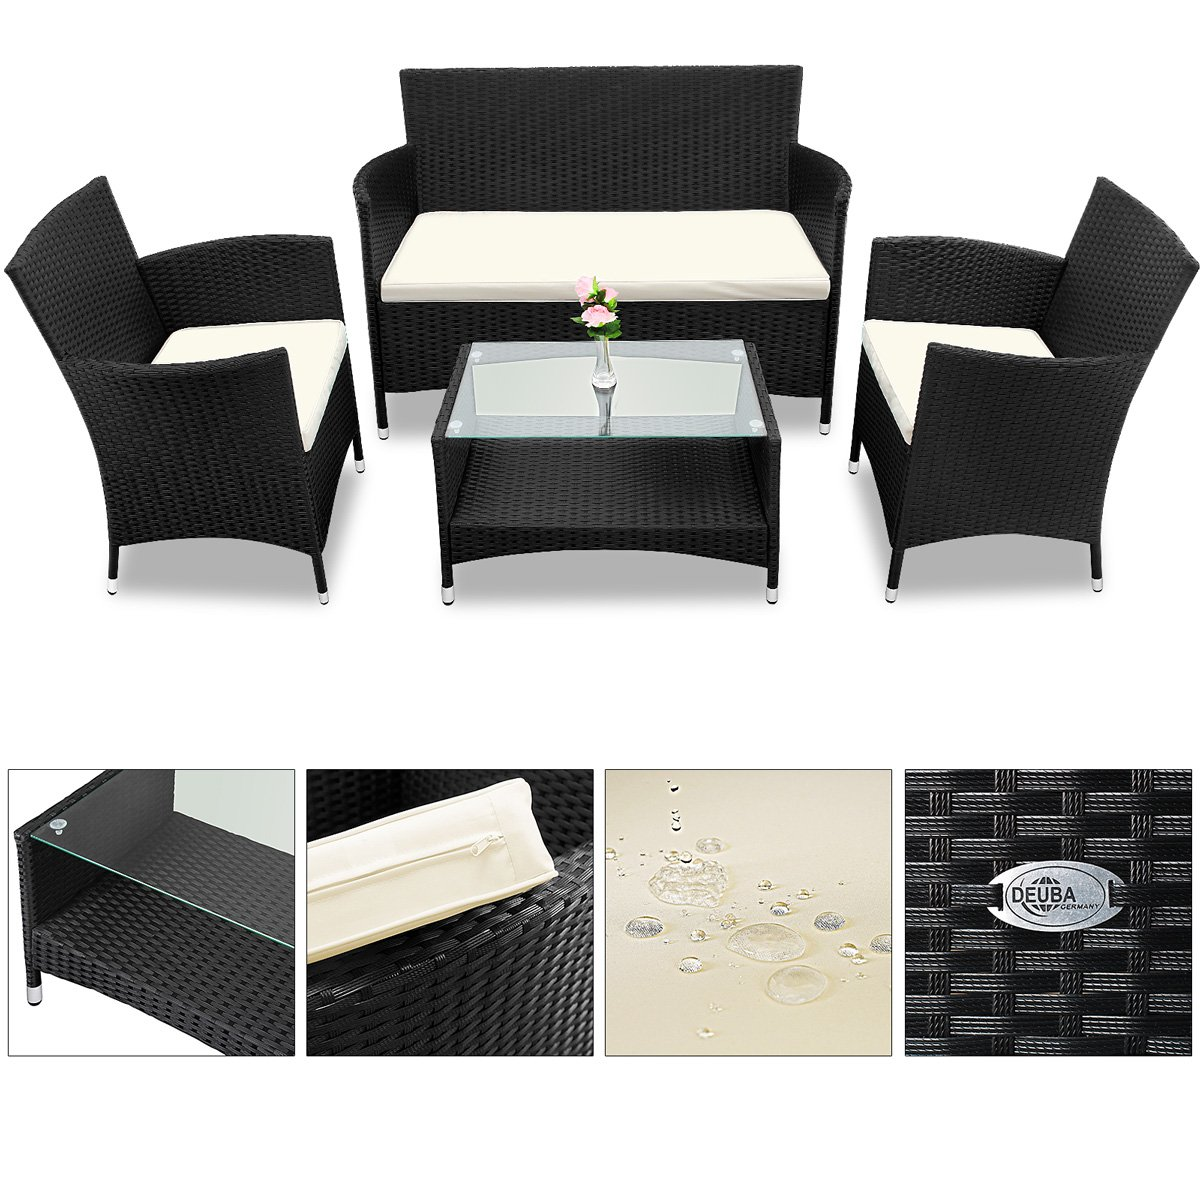 Amazon.de: Deuba® Poly Rattan 4+1 Sitzgruppe Schwarz | 7cm dicke ...